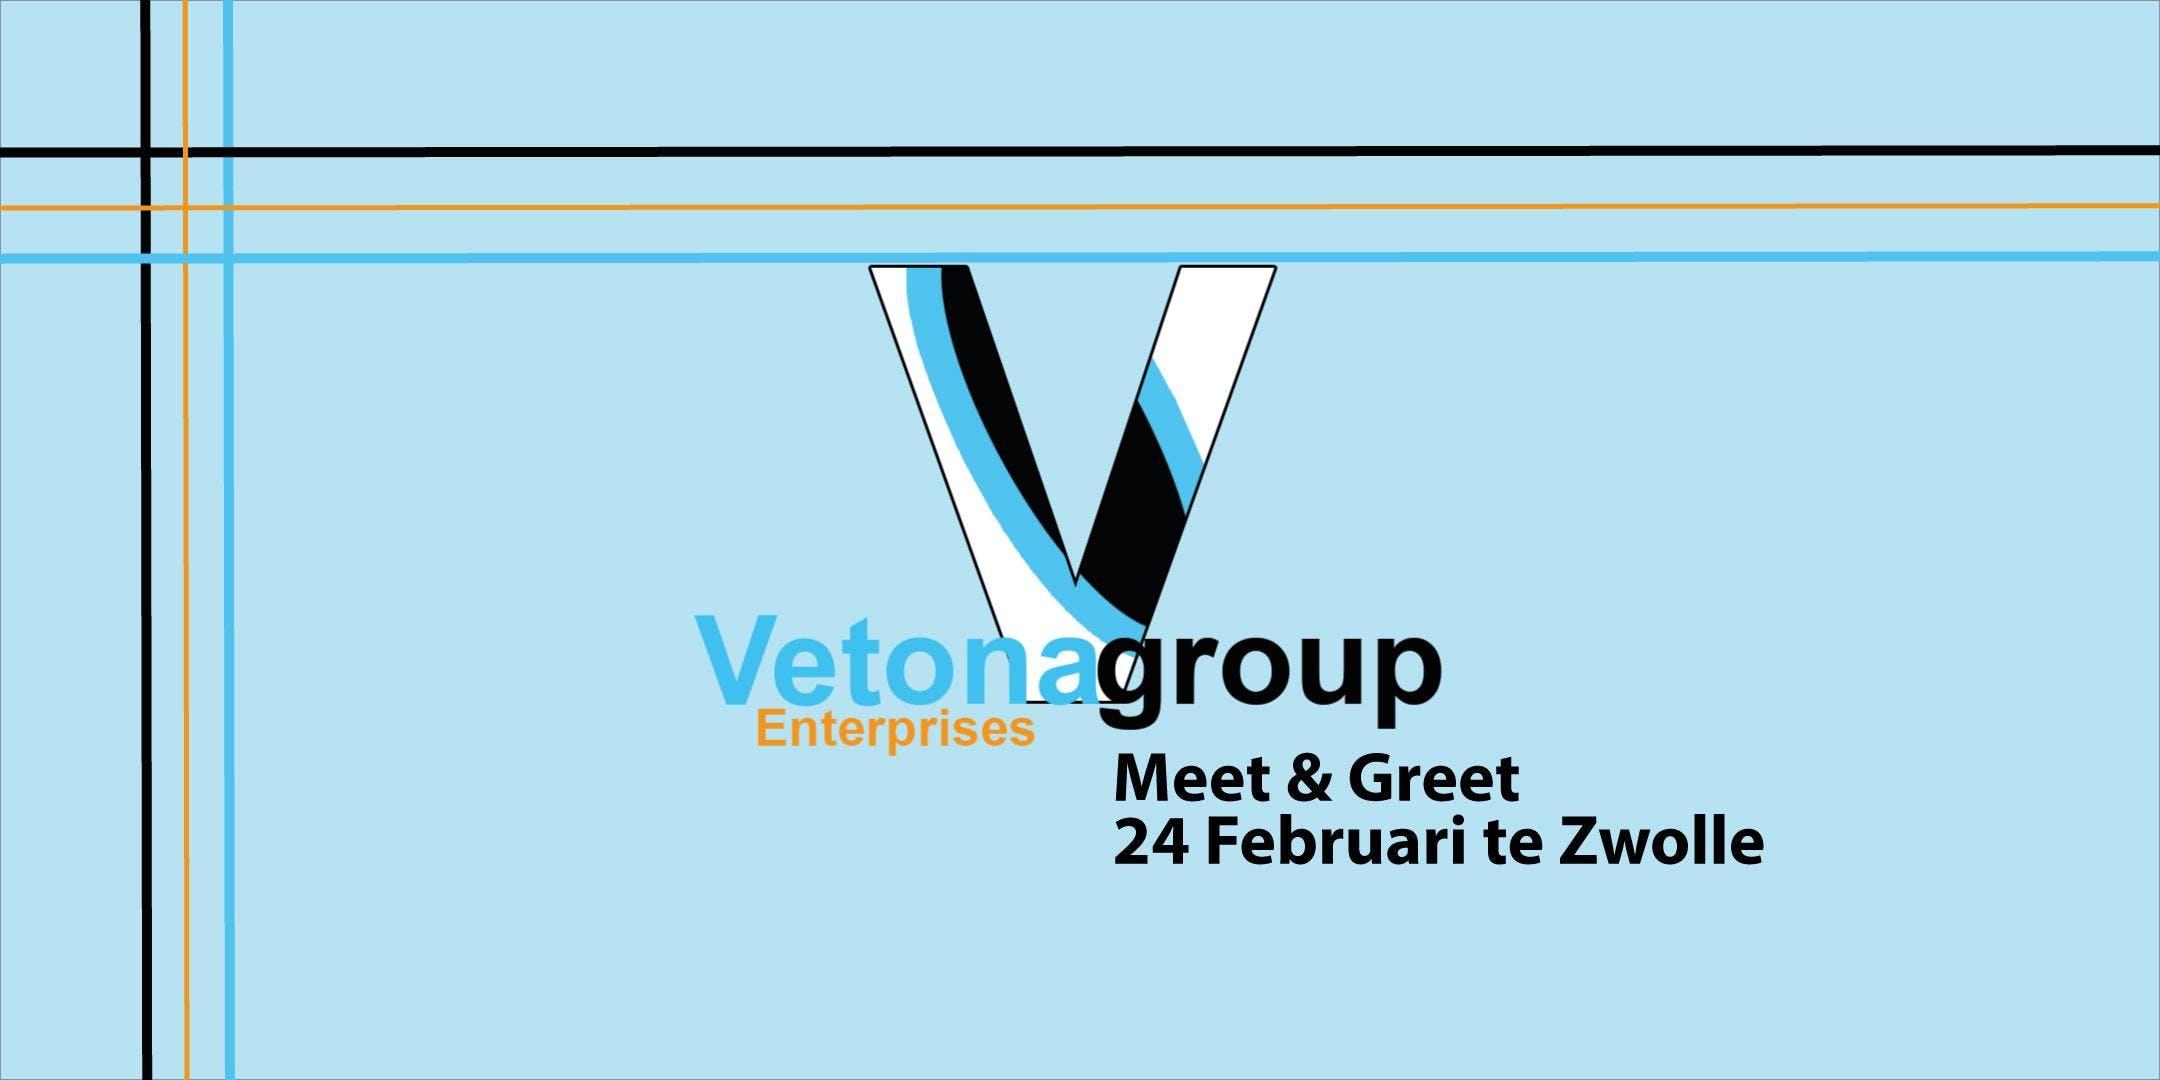 Meet & Greet 24 Februari 2019